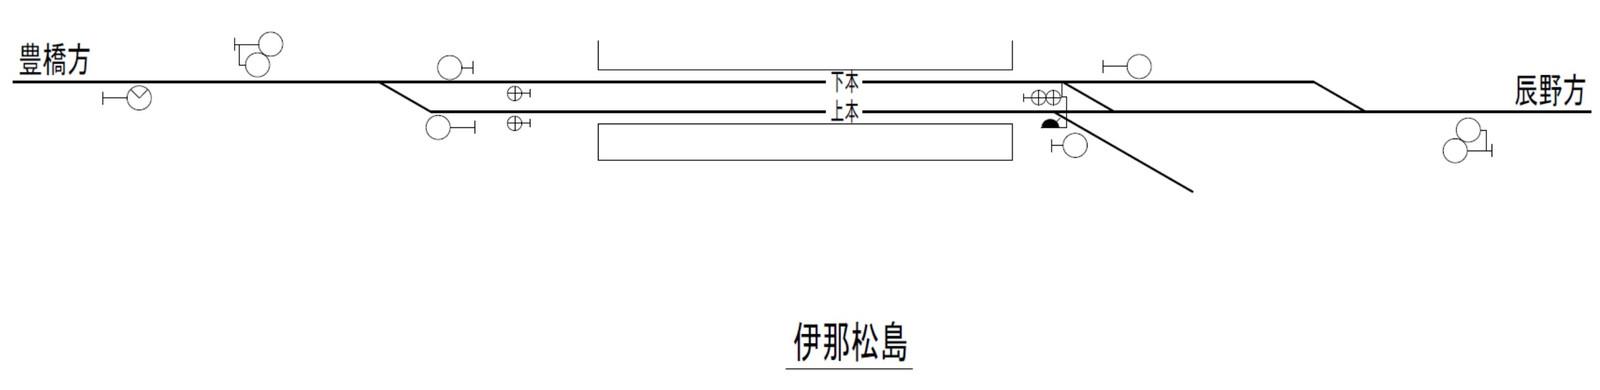 20160104